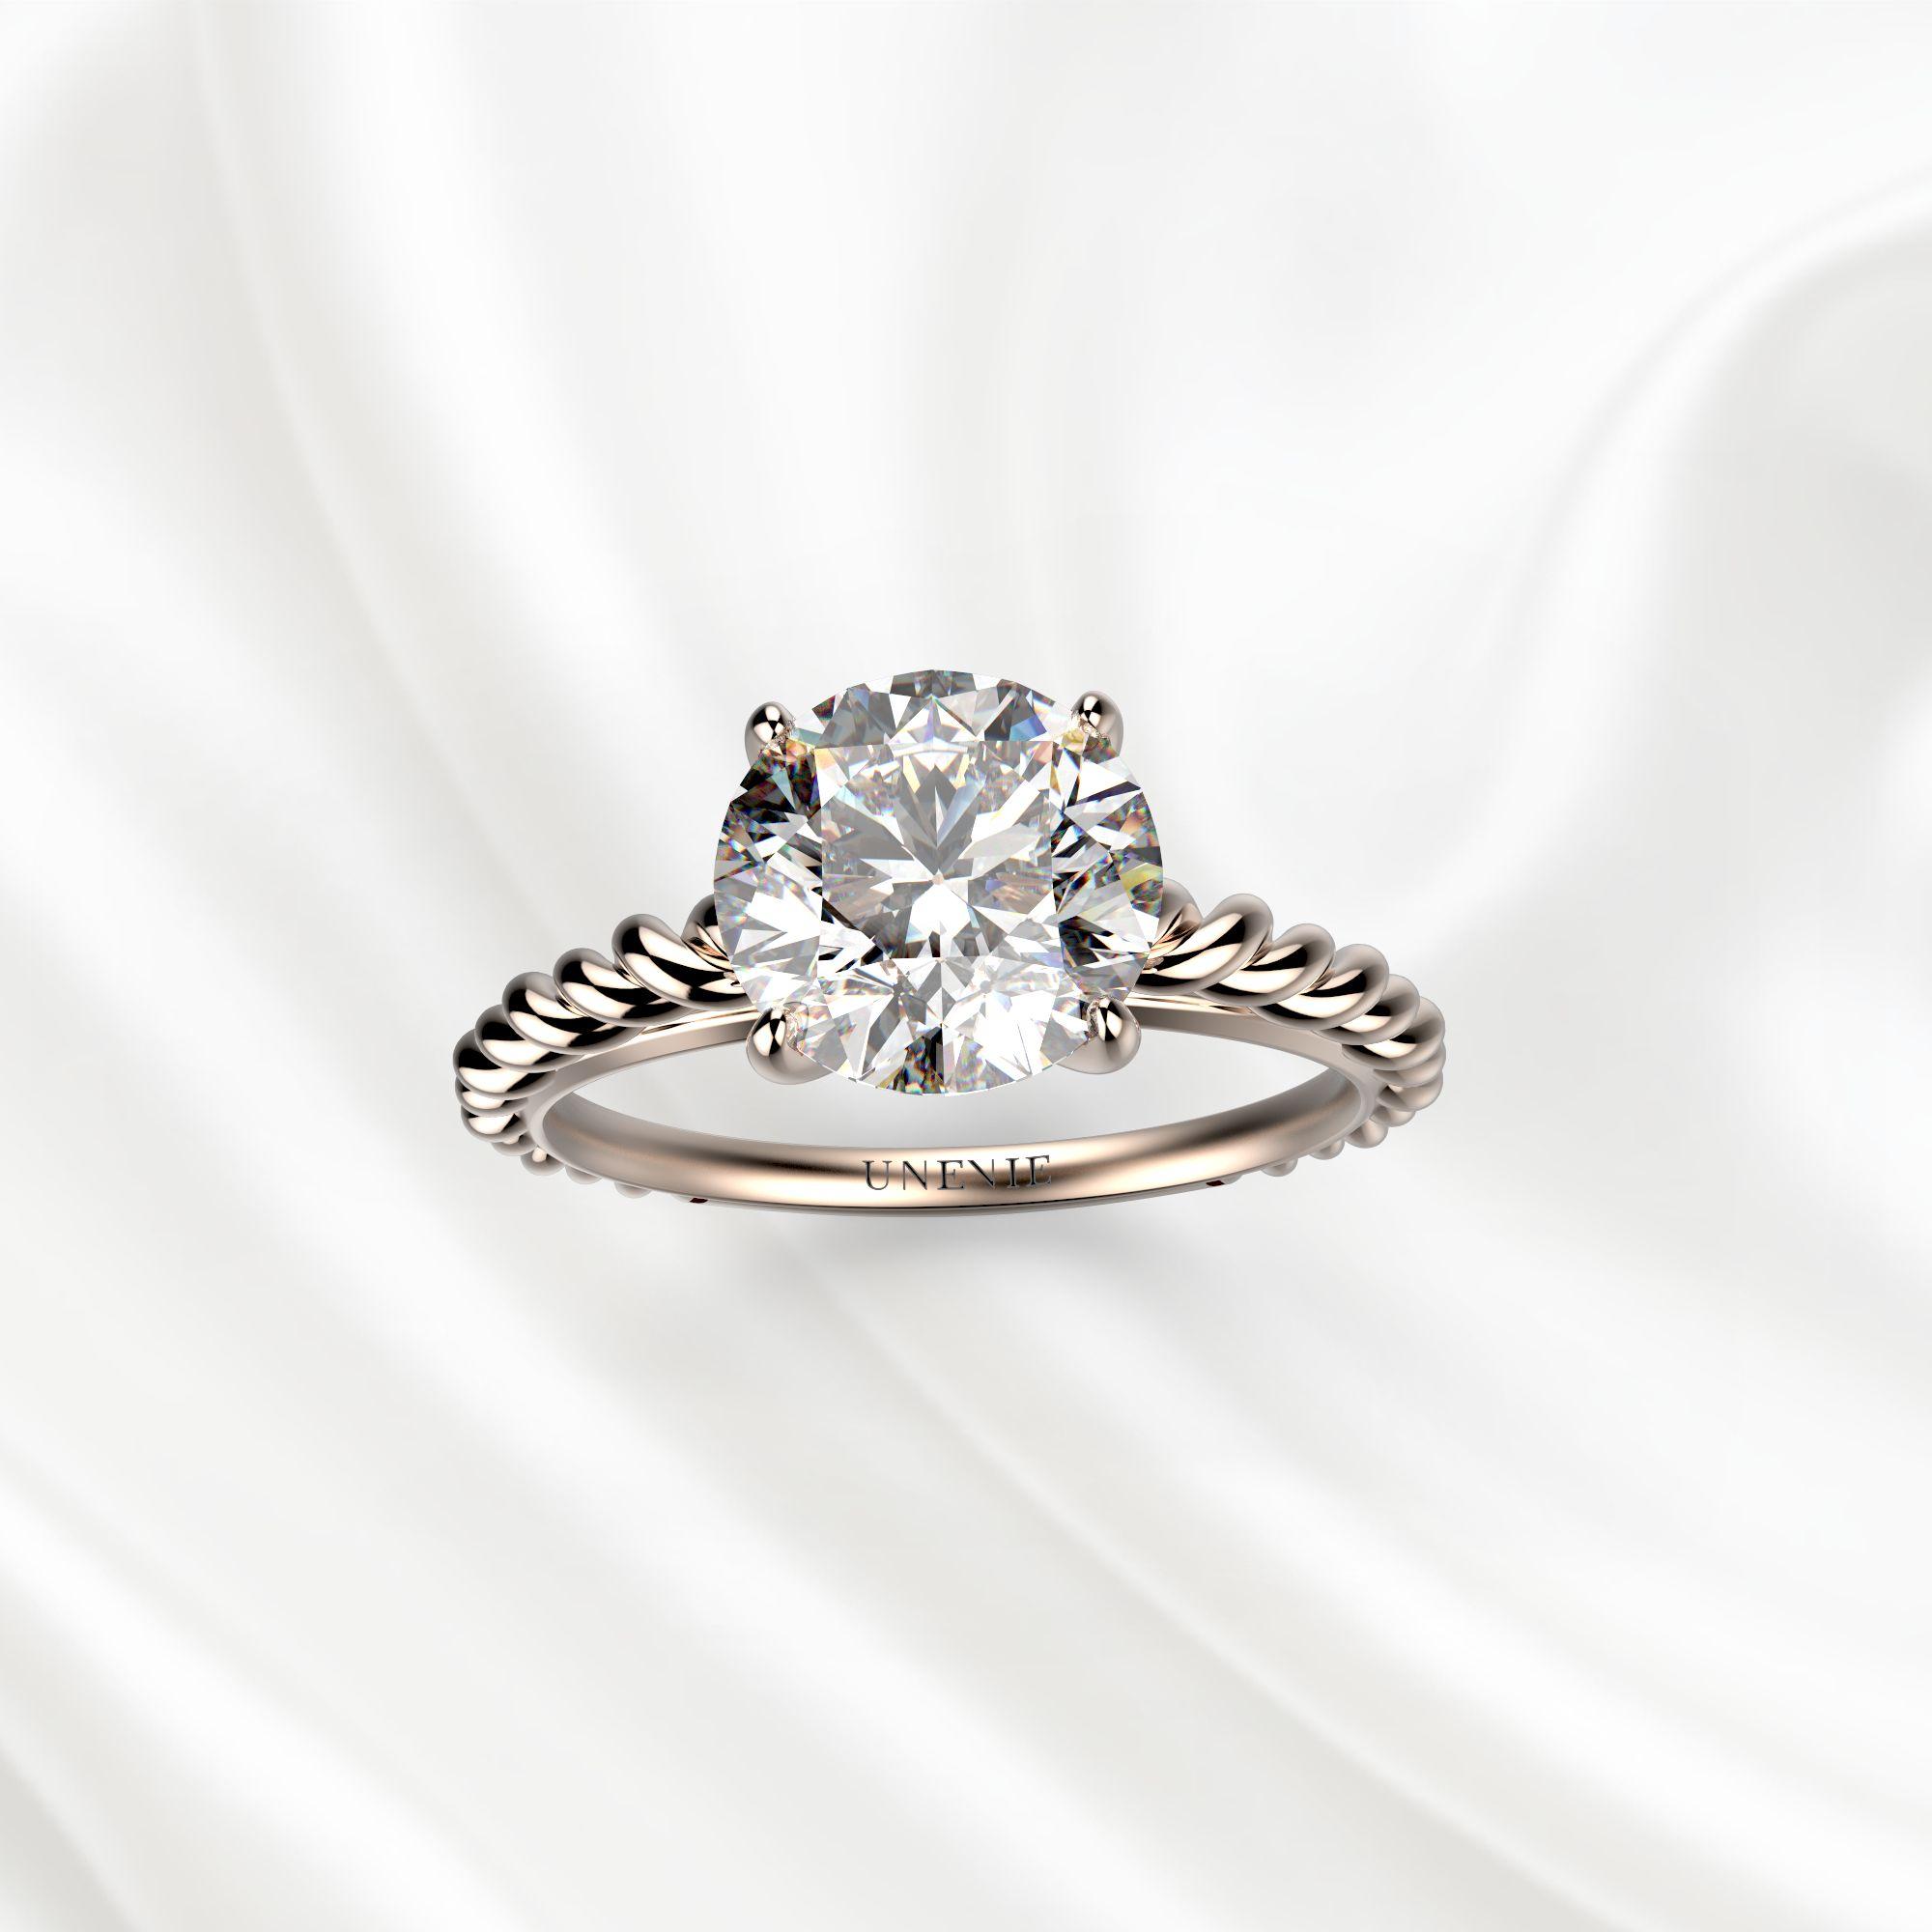 N14 Помолвочное кольцо из розового золота с бриллиантом 0.6 карат